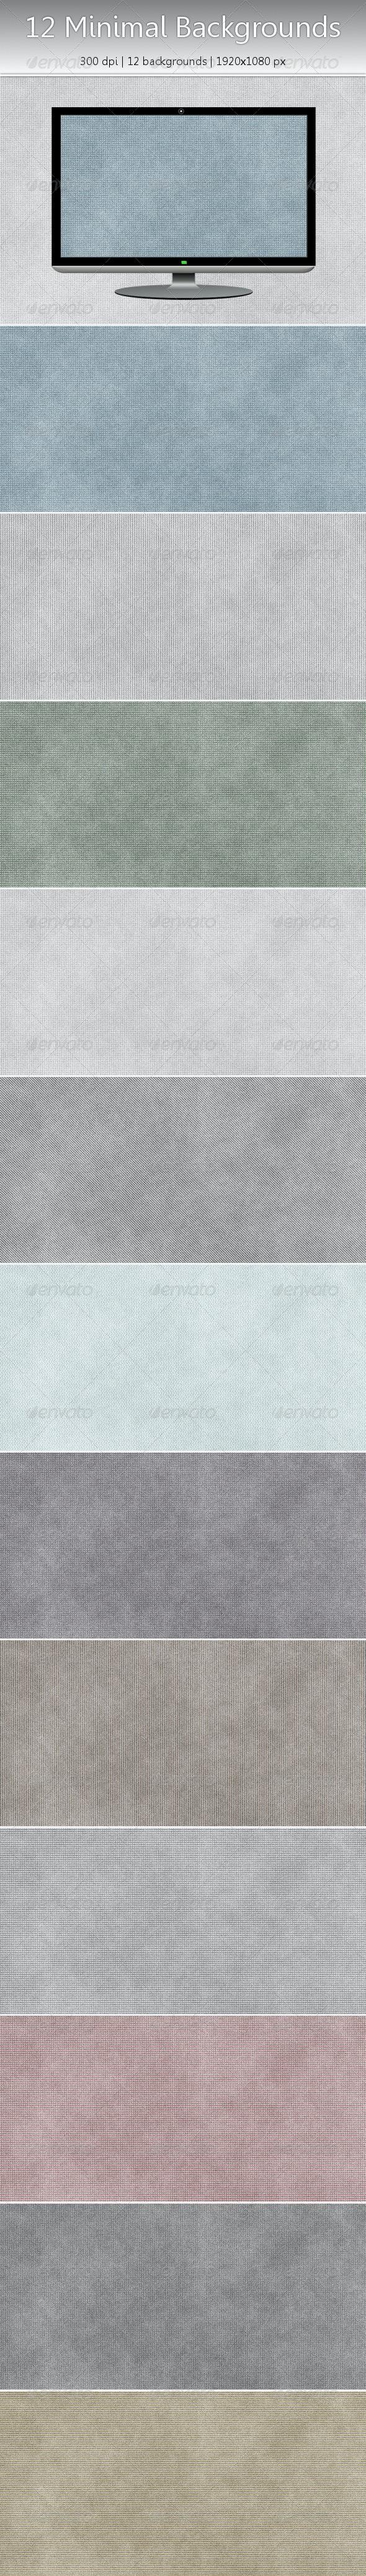 12 Subtle Minimal Backgrounds (JPG + Flat PNG) - Miscellaneous Backgrounds